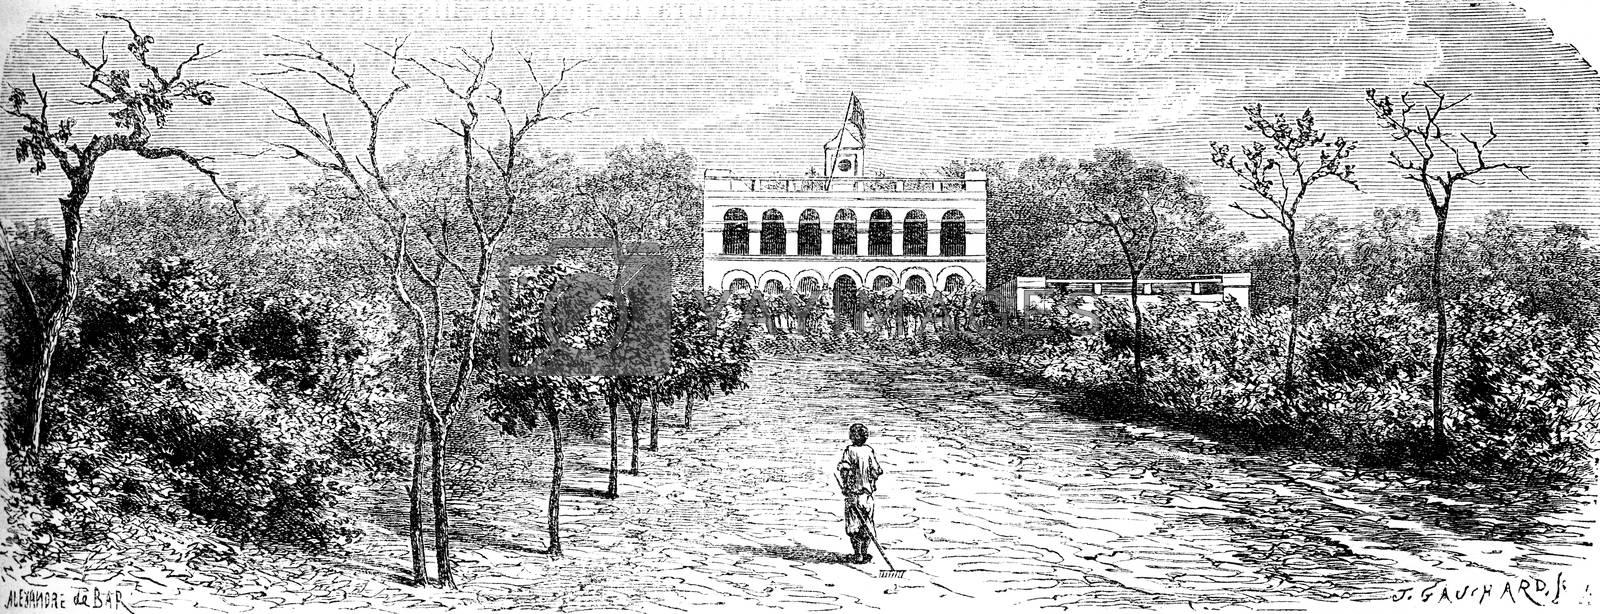 Castle Richard Toll, vintage engraved illustration. Le Tour du Monde, Travel Journal, (1872).